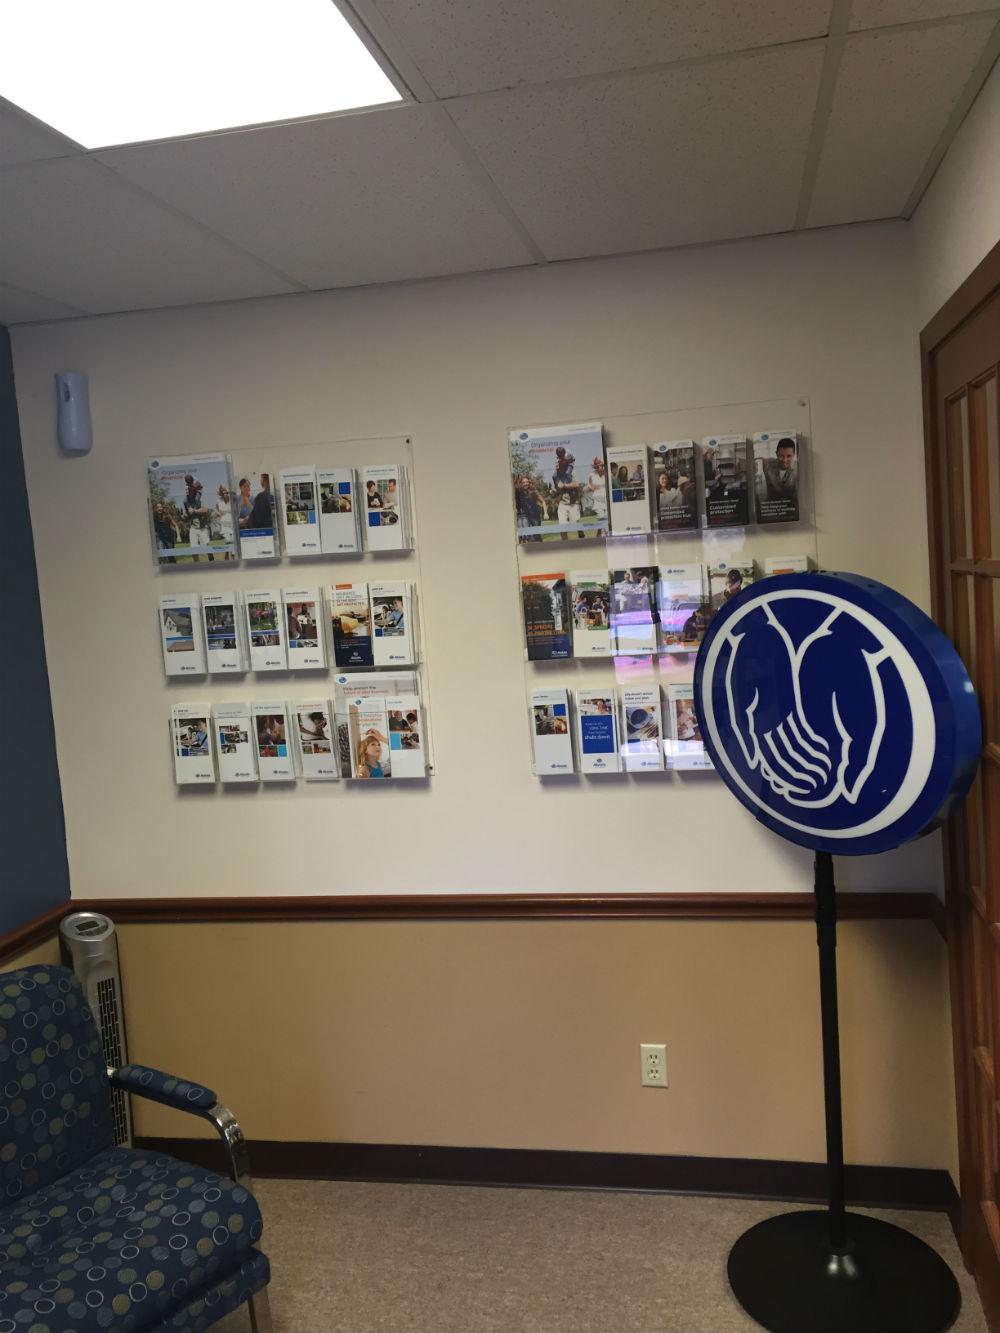 Shield Insurance Agency: Allstate Insurance image 3